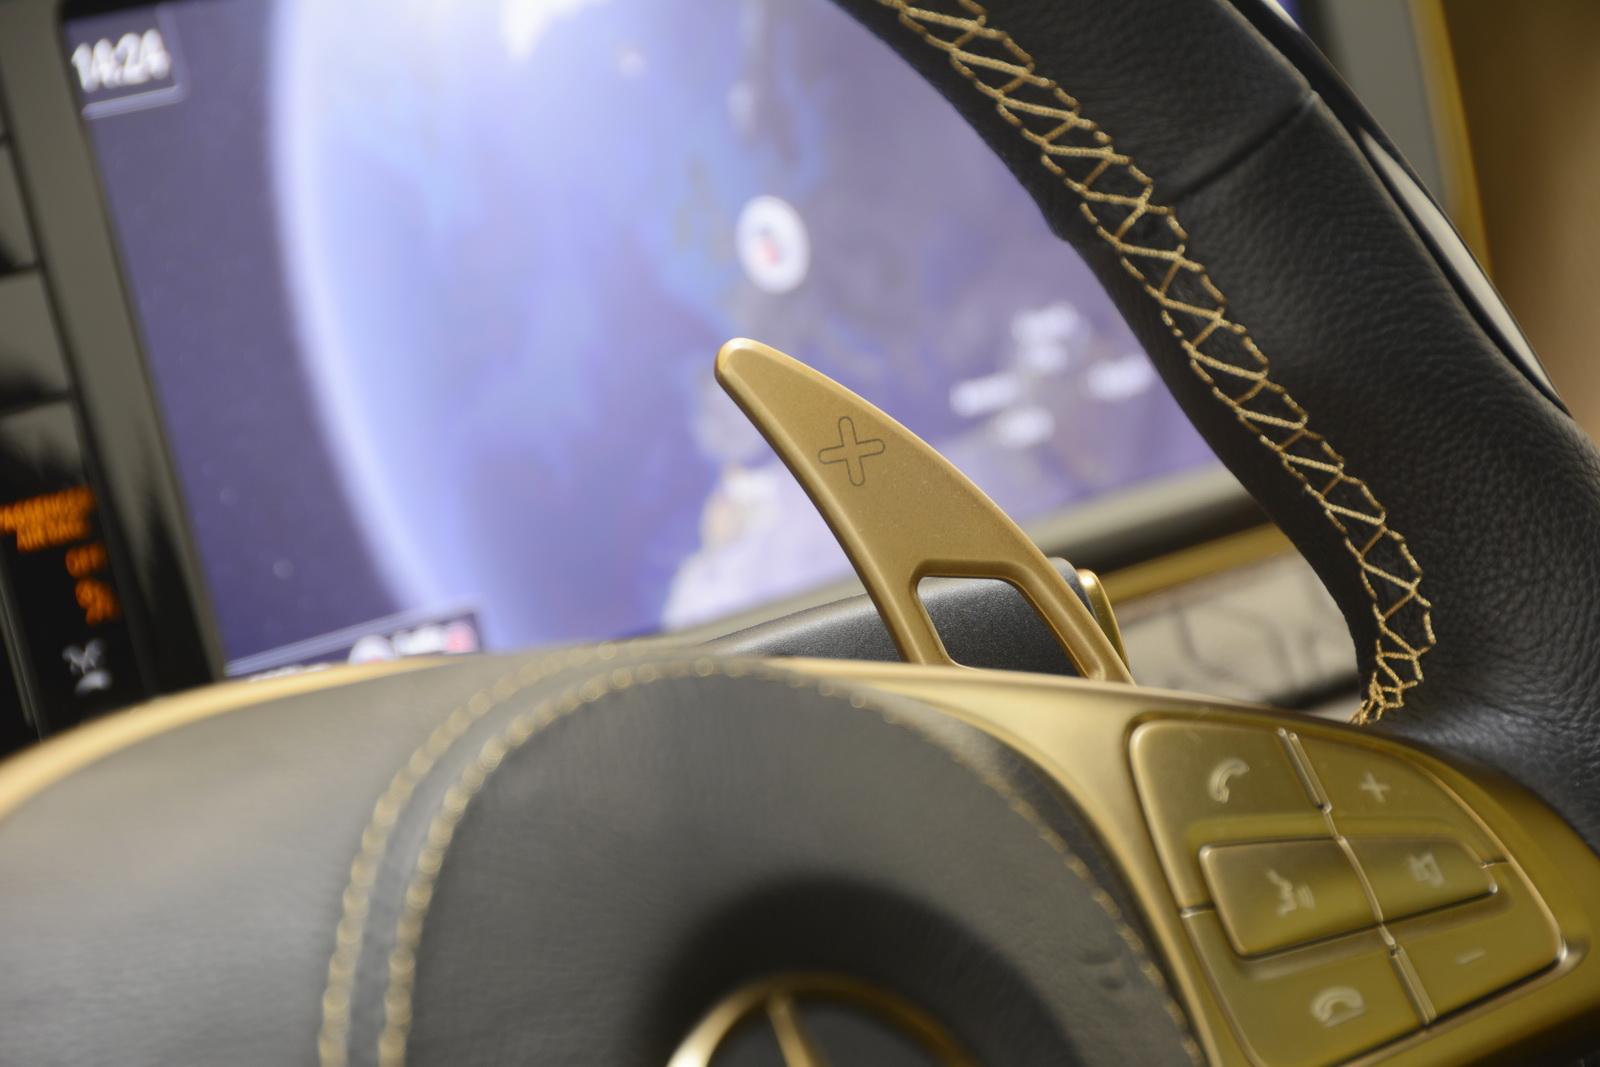 Brabus Rocket 900 Desert Gold